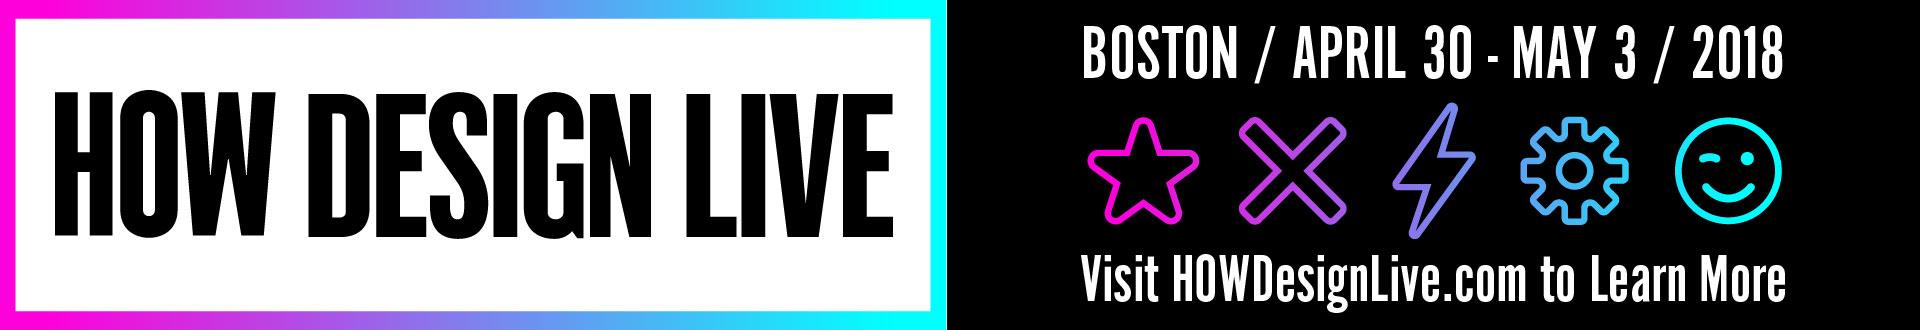 how design live ticket giveaway